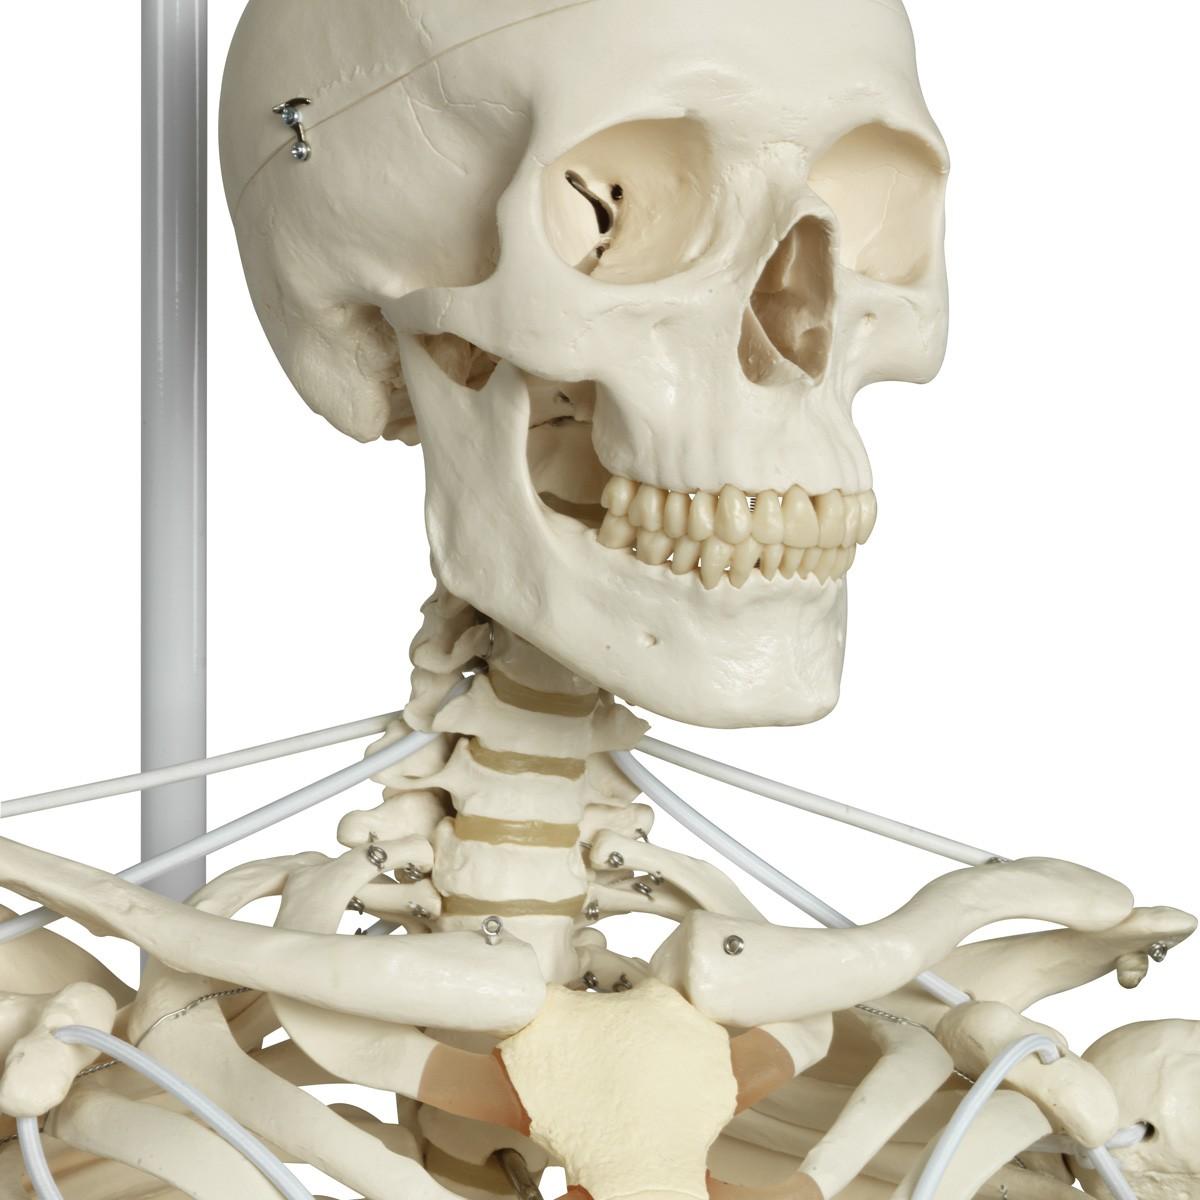 Feldi, das Funktionelle Skelettmodell